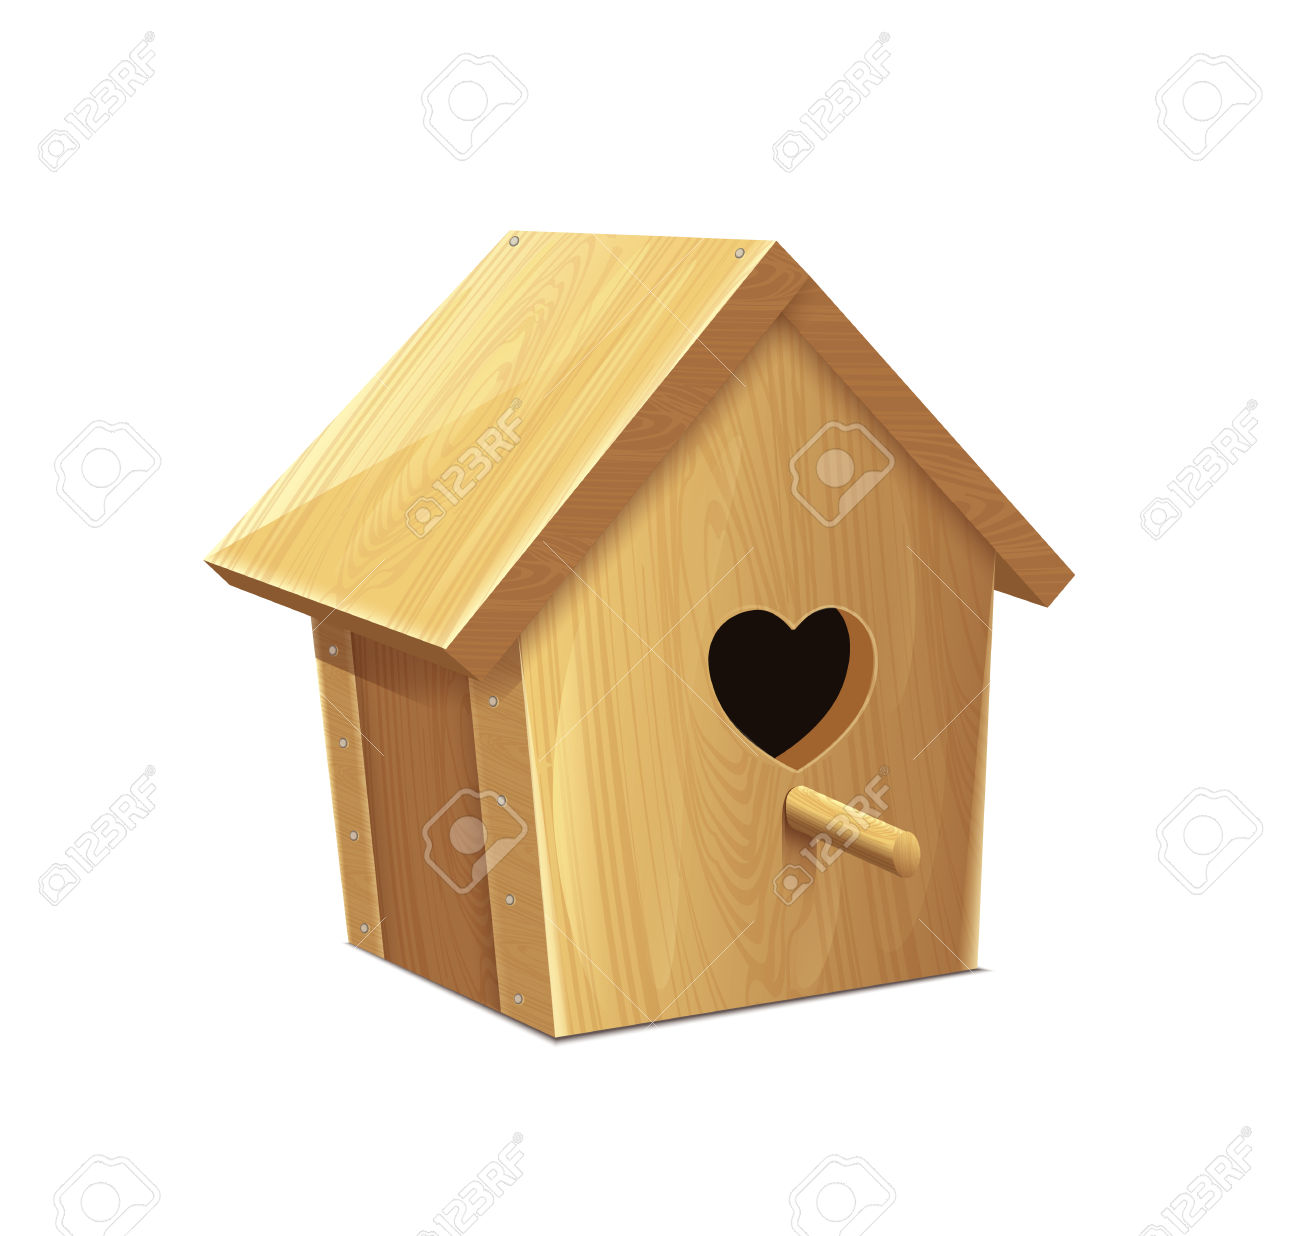 Nesting Box Heart Royalty Free Cliparts, Vectors, And Stock.